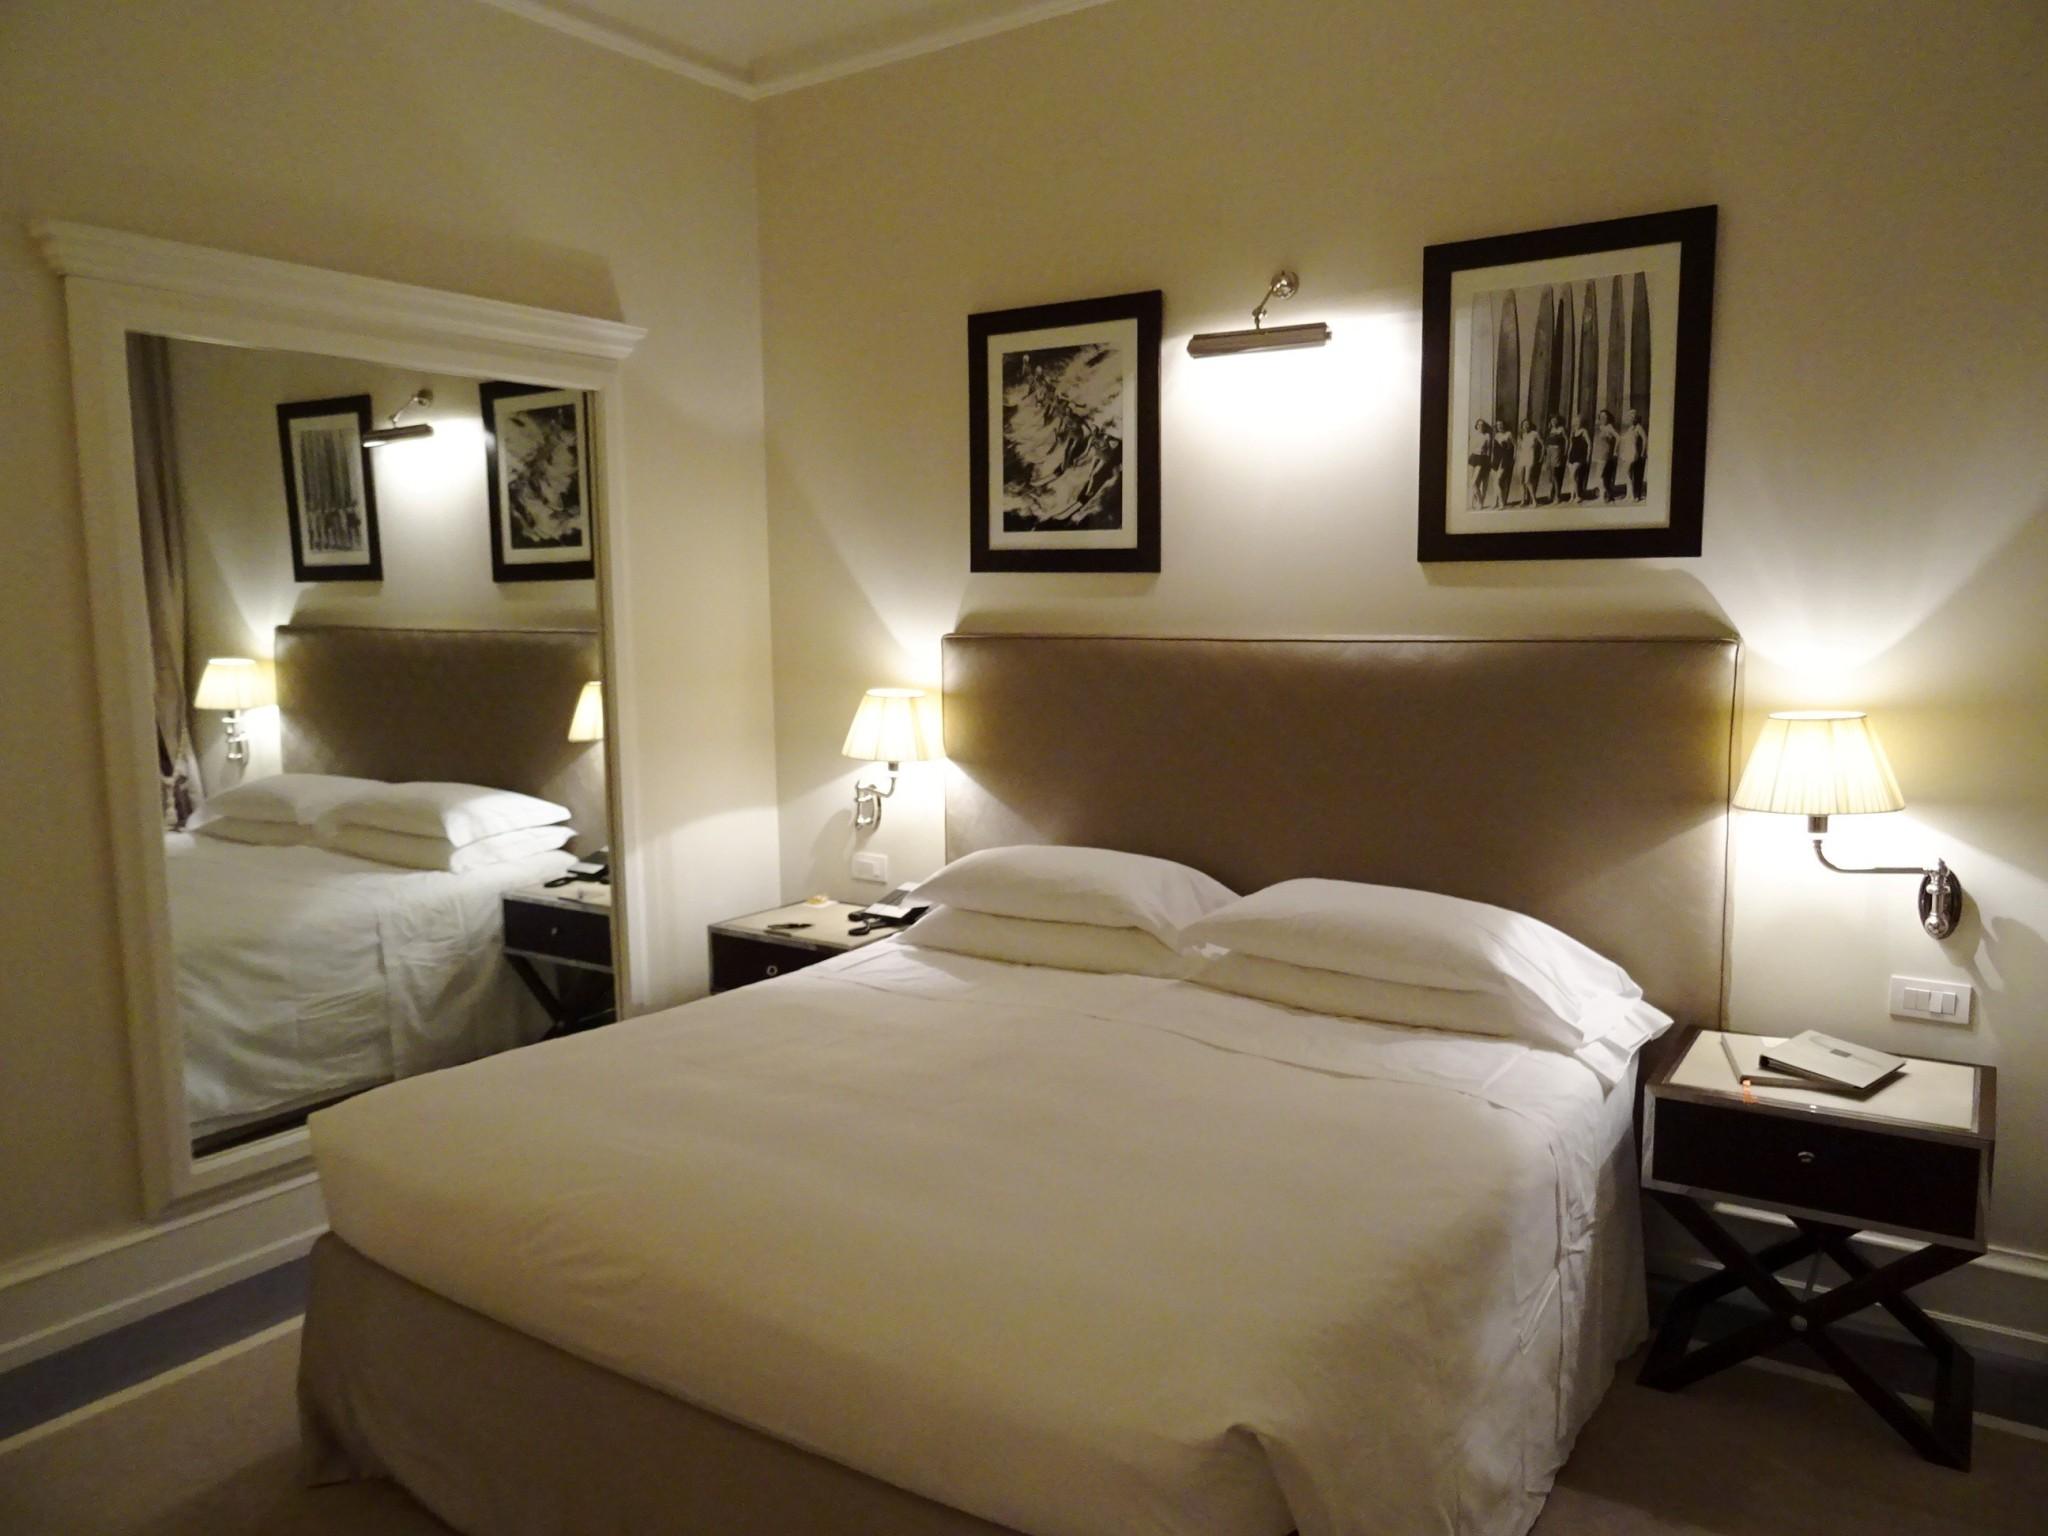 Hotellihuoneeni